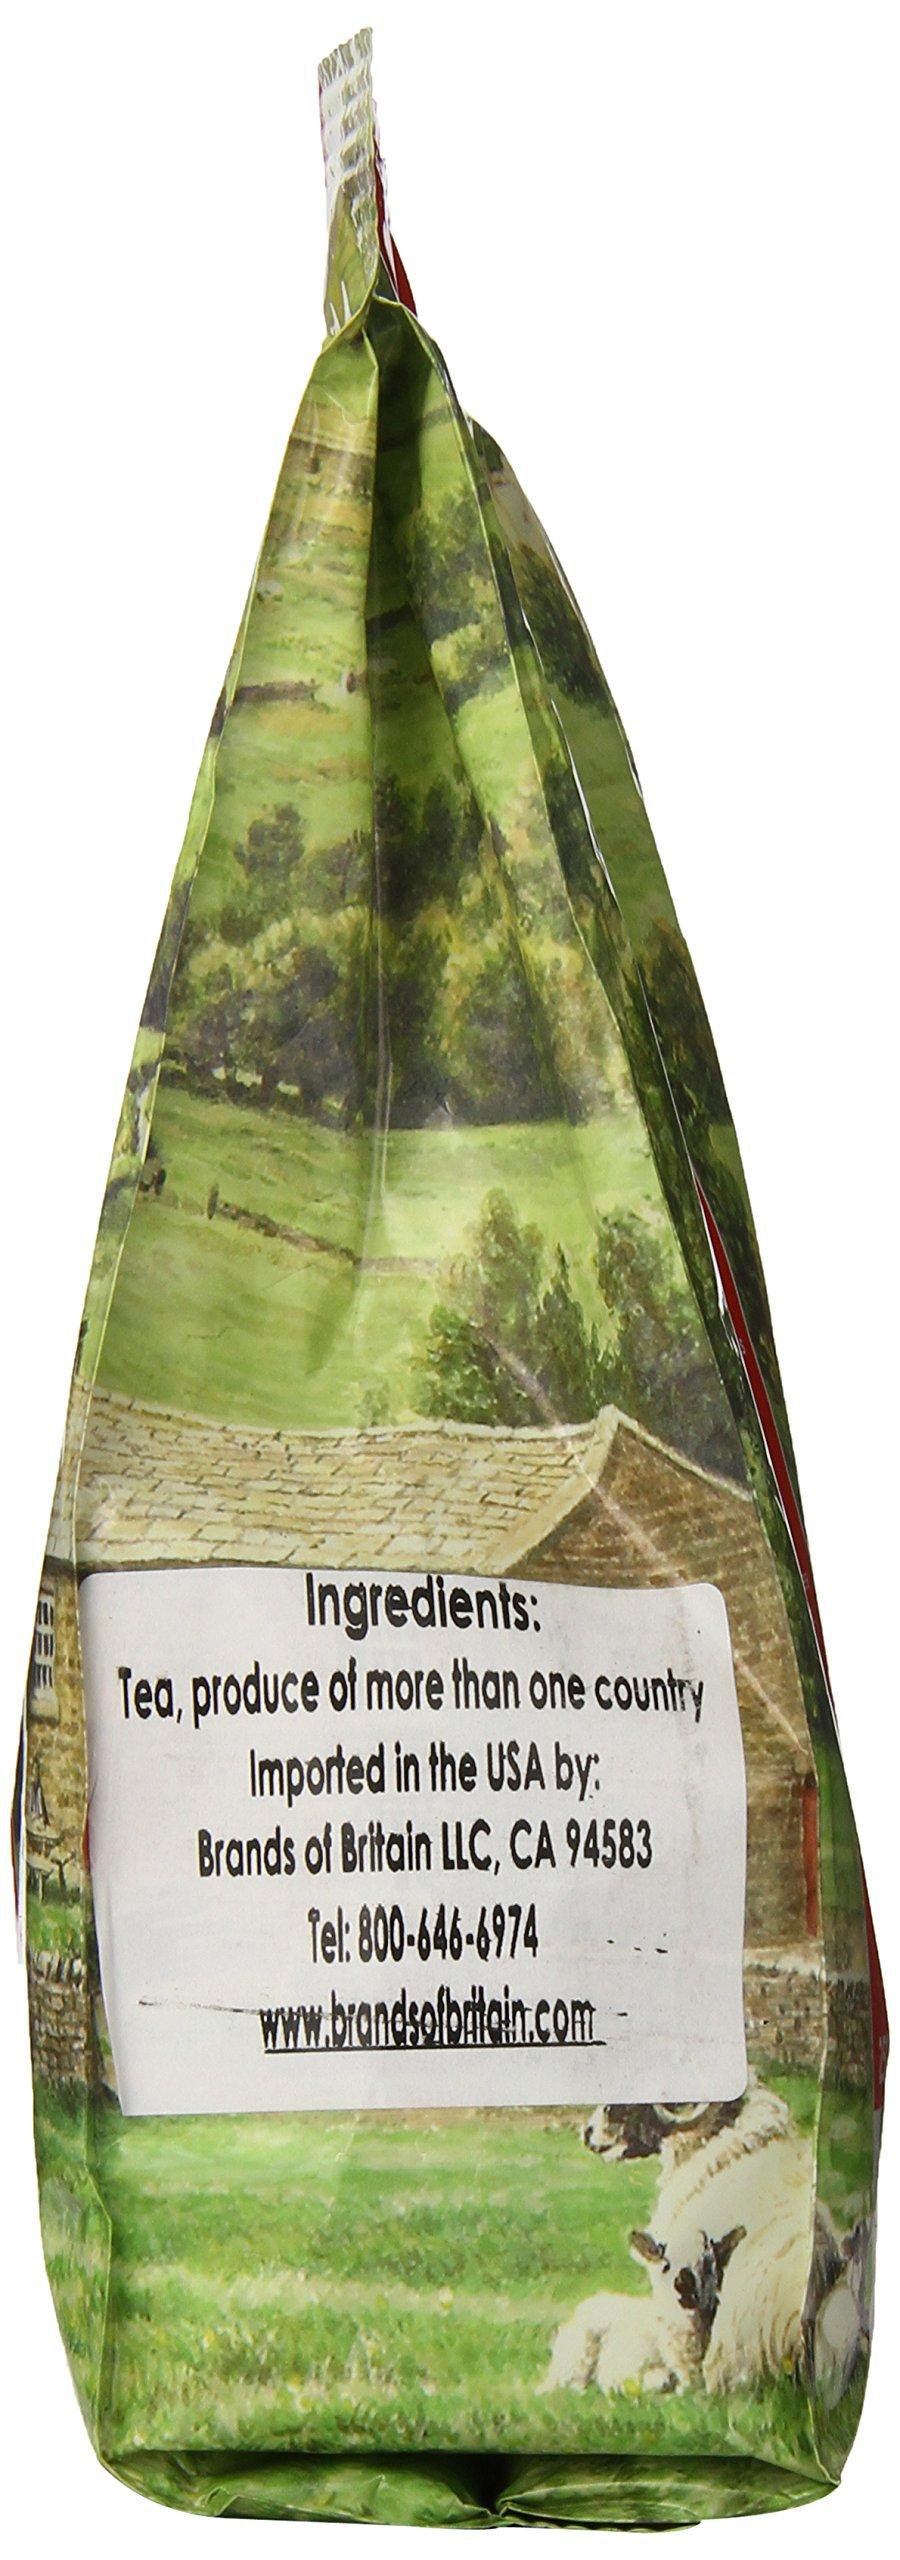 Taylors-of-Harrogate-Yorkshire-Tea-loose-250g-loser-schwarzer-Tee